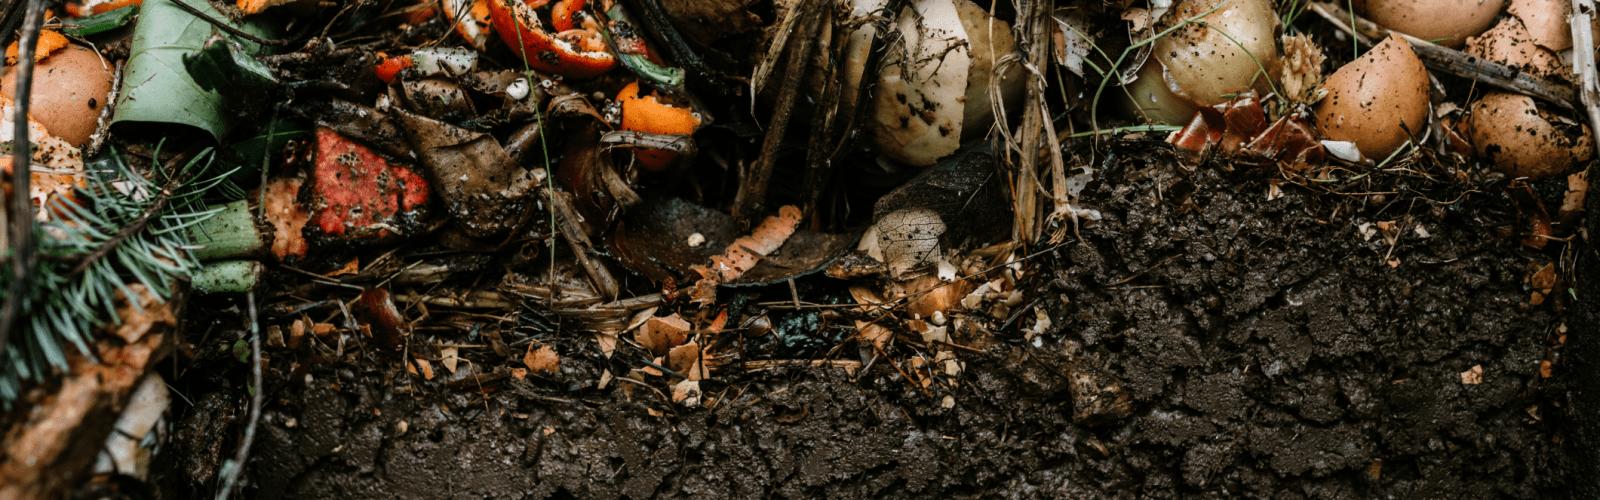 food scrap compost organic soil